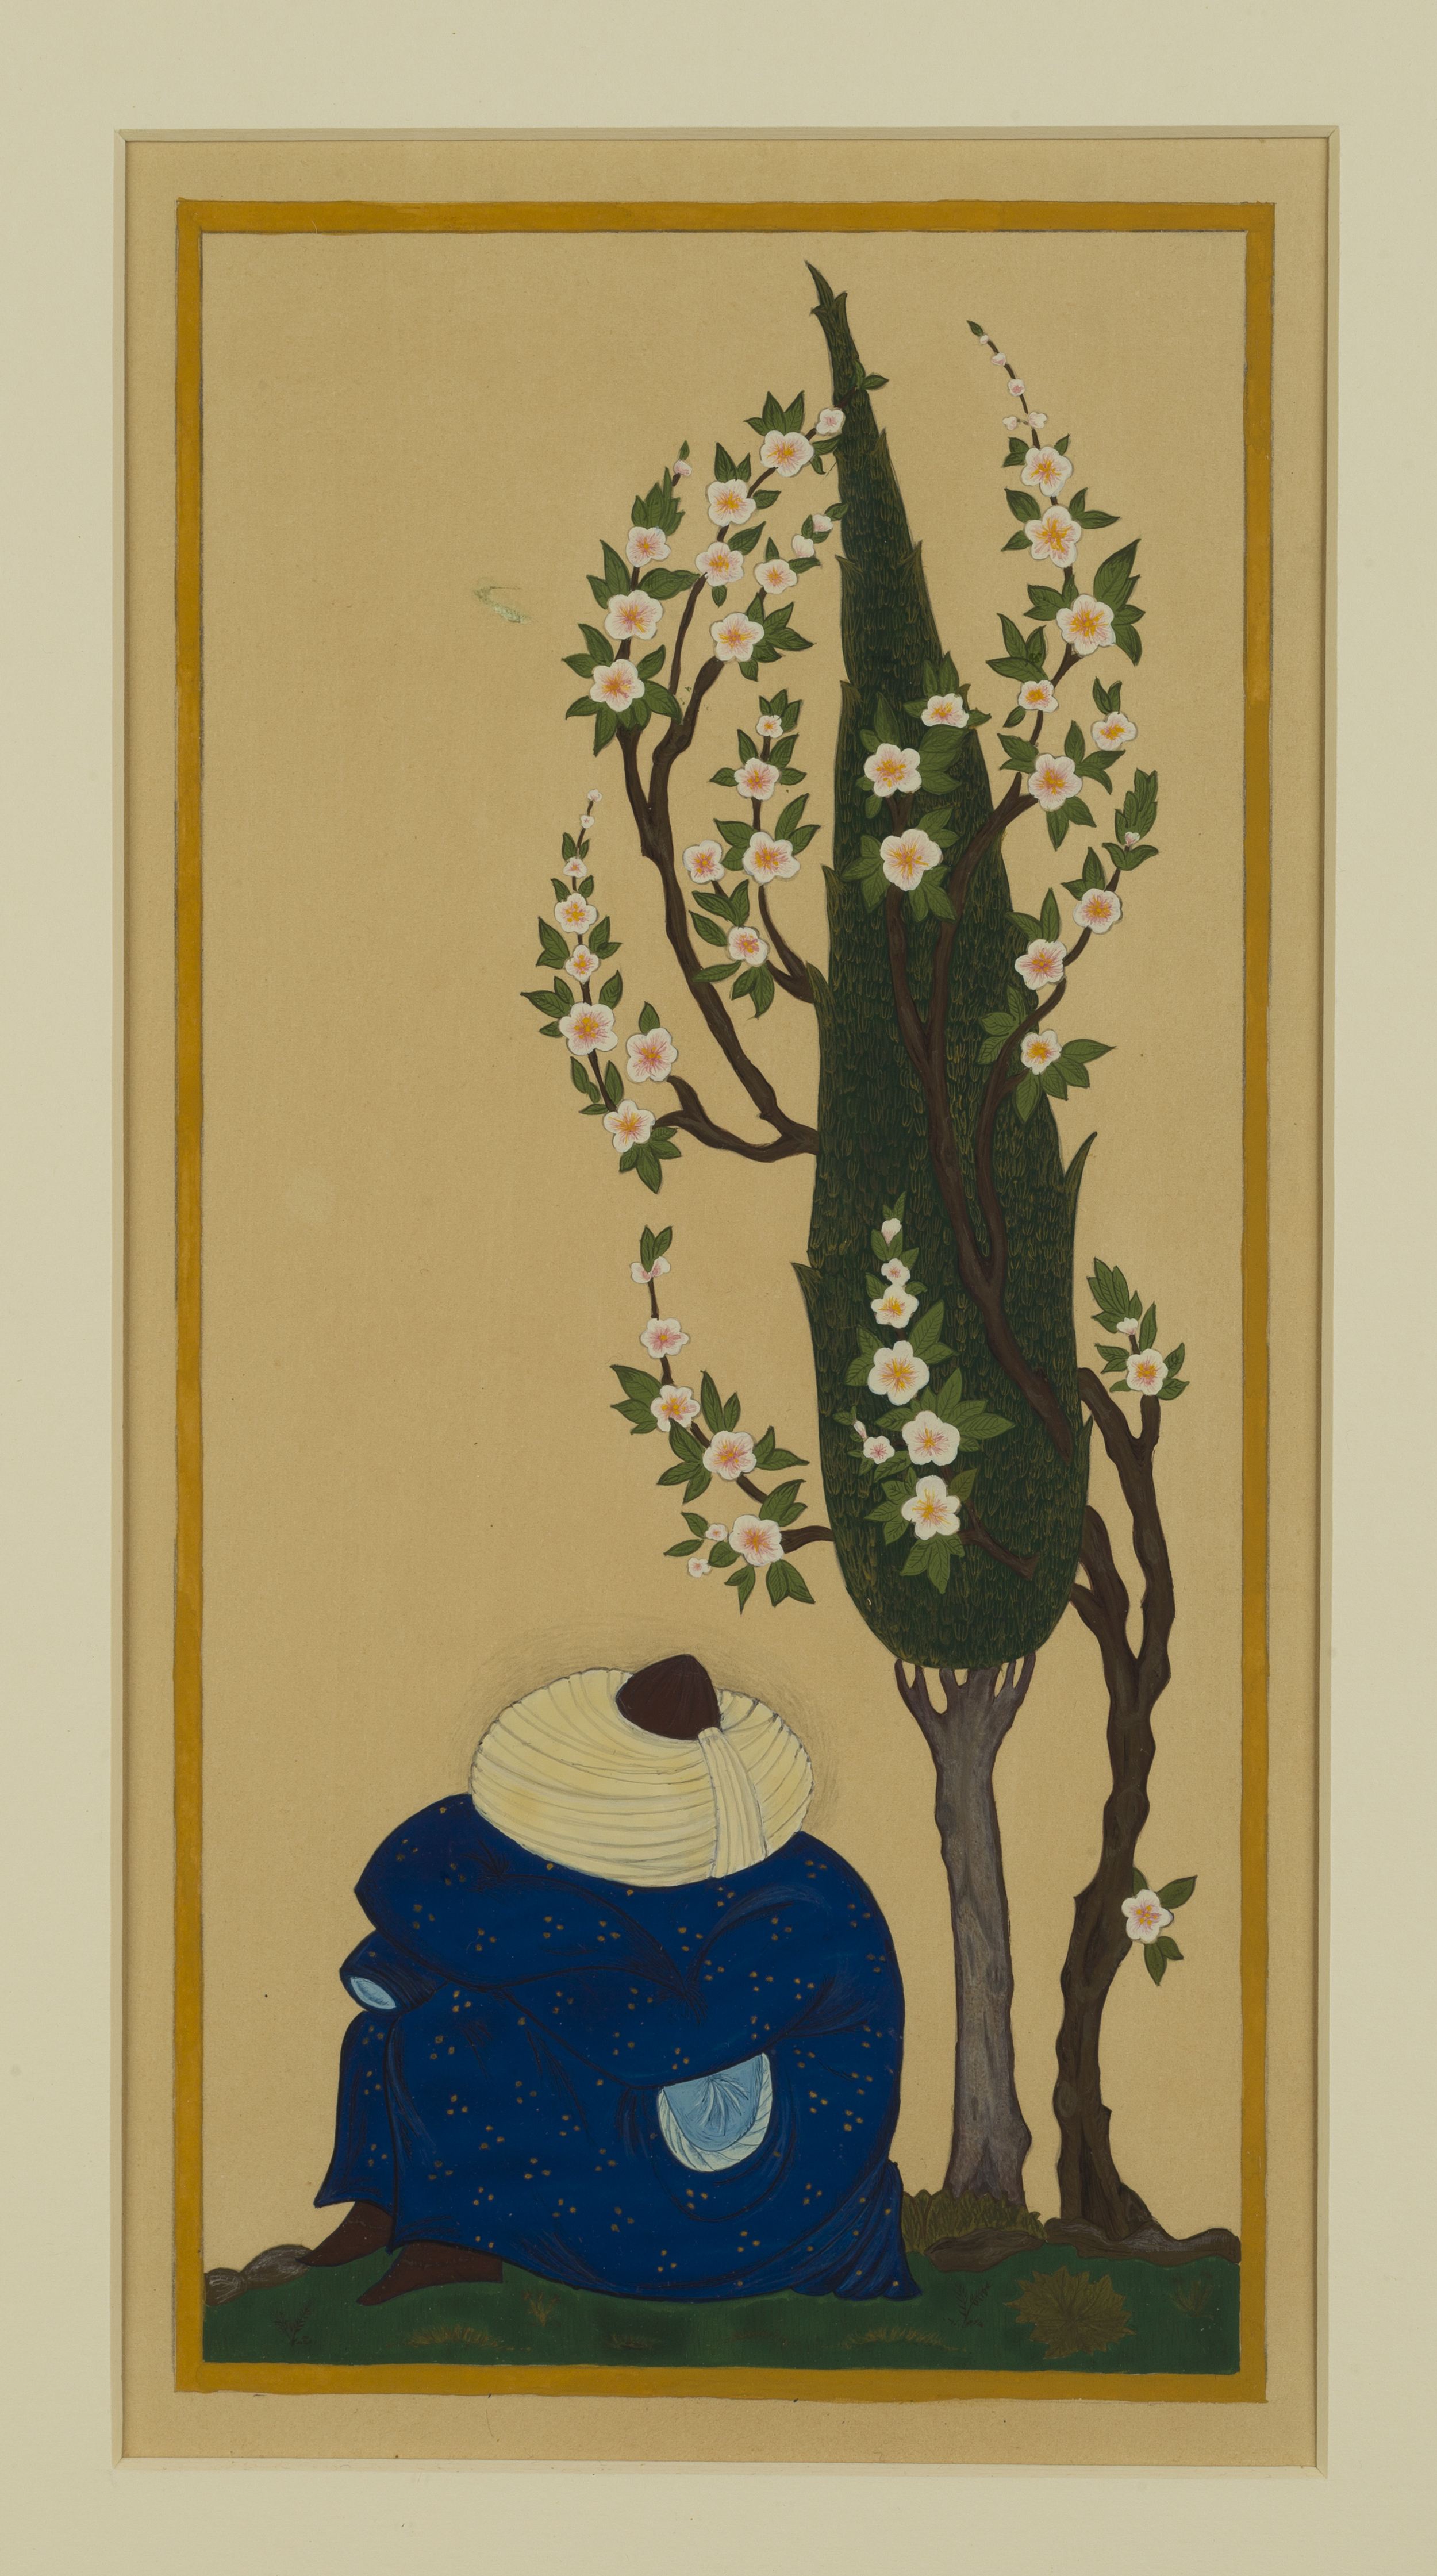 Sleeping Sufi ~ Persian Islamic Art, Pattern Design, Shaheen Kasmani.